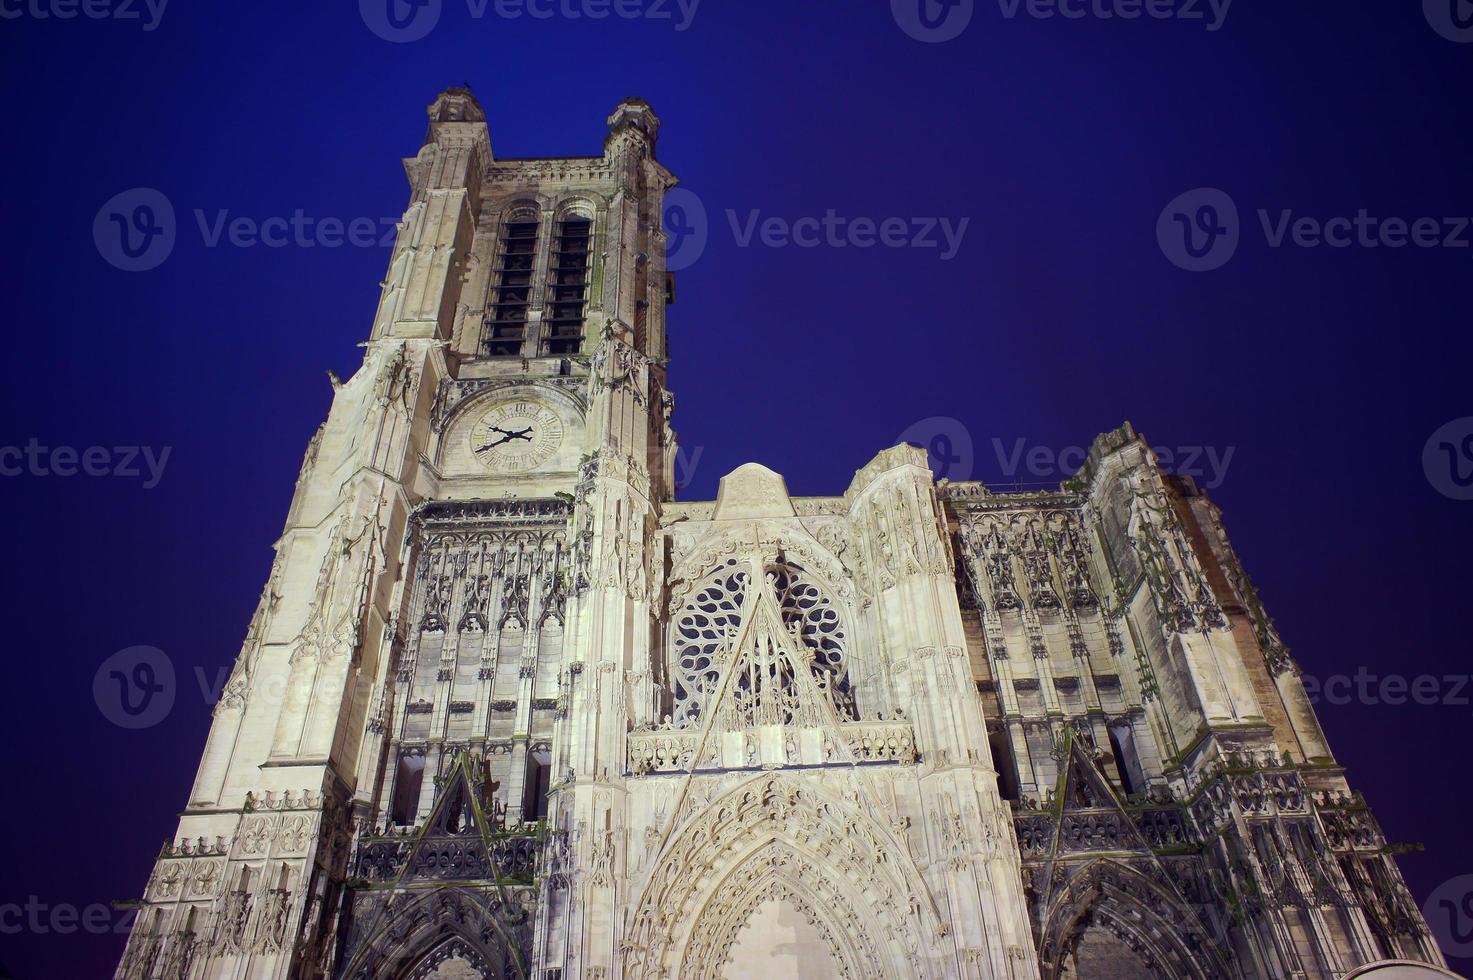 facciata gotica della cattedrale di saint-pierre-et-saint-paul foto